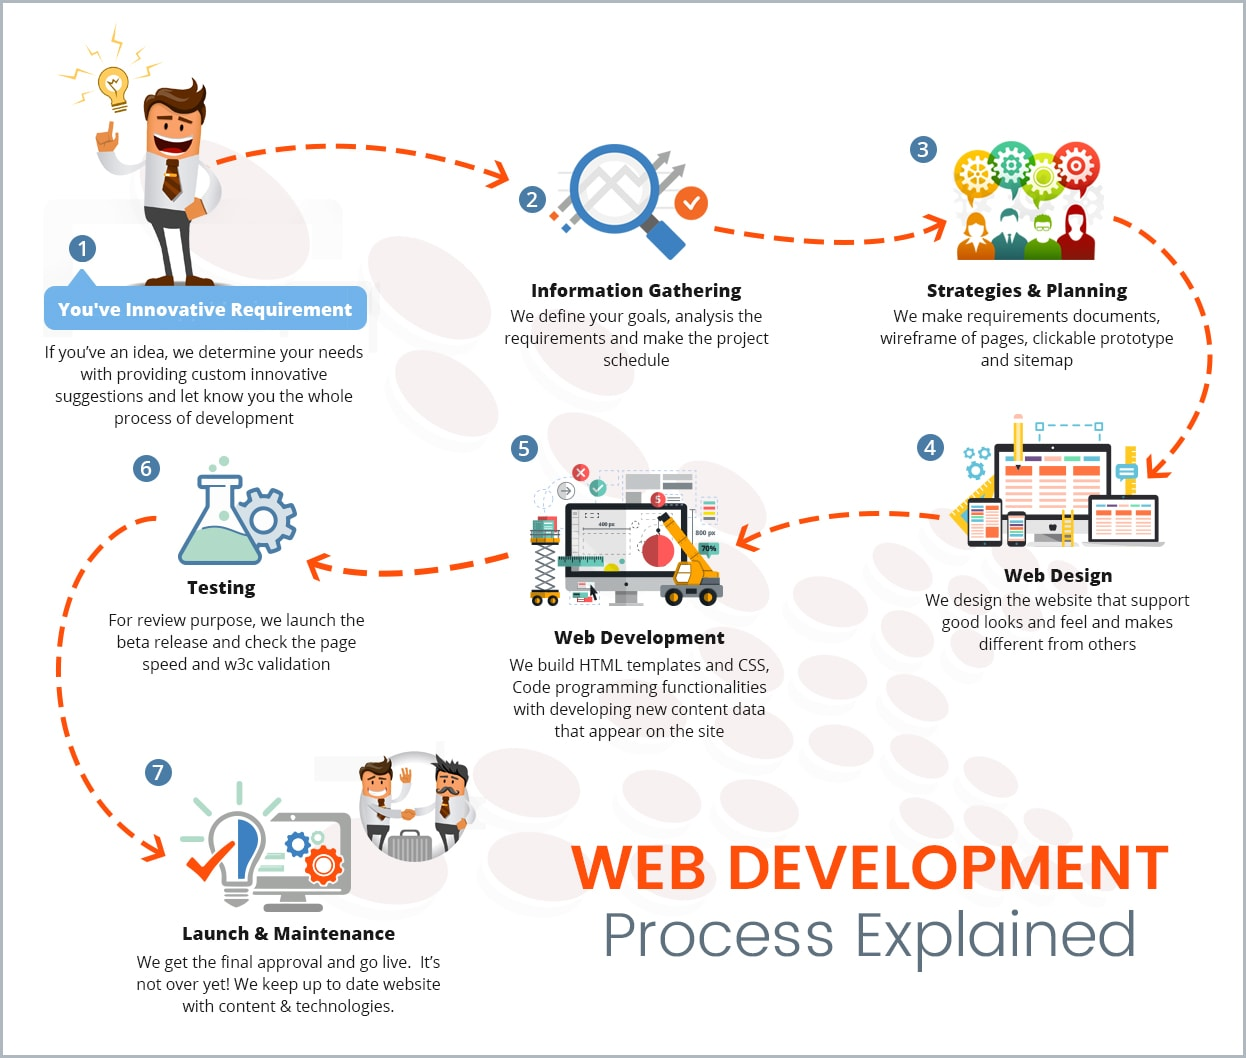 Website Development Process Explained